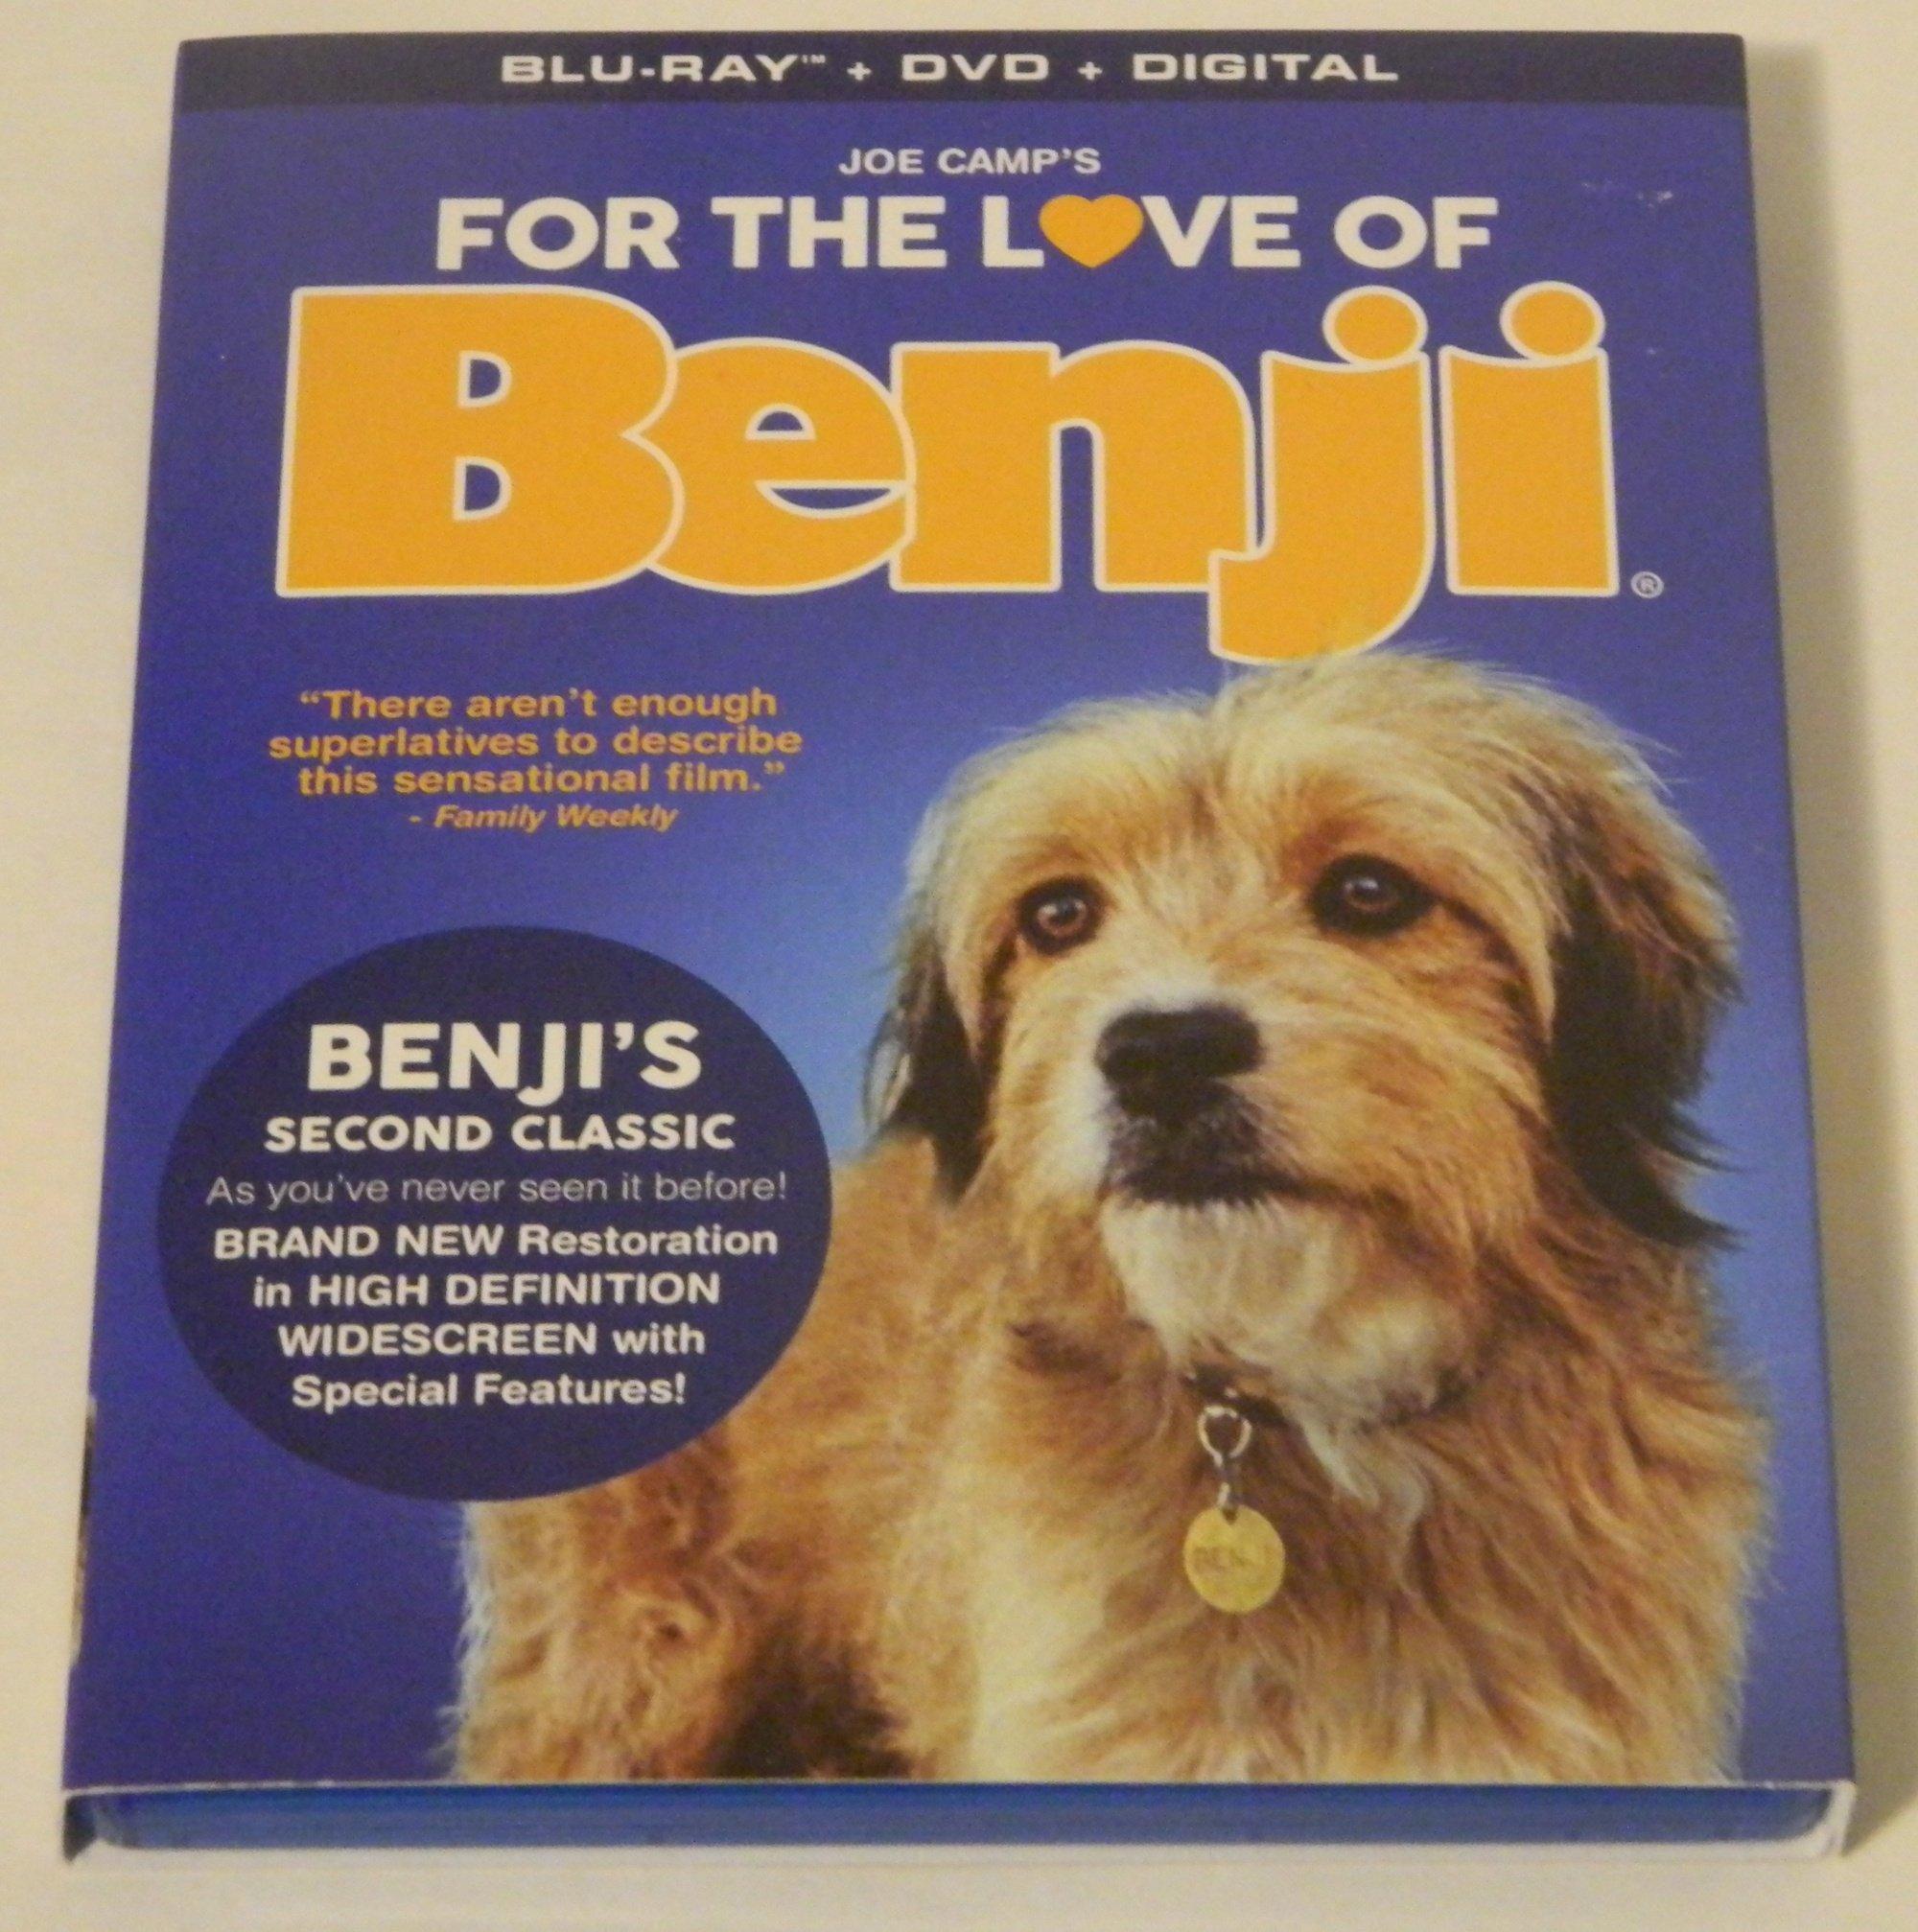 Great For Love Benji Love Benji Review Geeky Hobbies Basenji Dog Breeds Don T Basenji Dog Breed bark post Benji Dog Breed